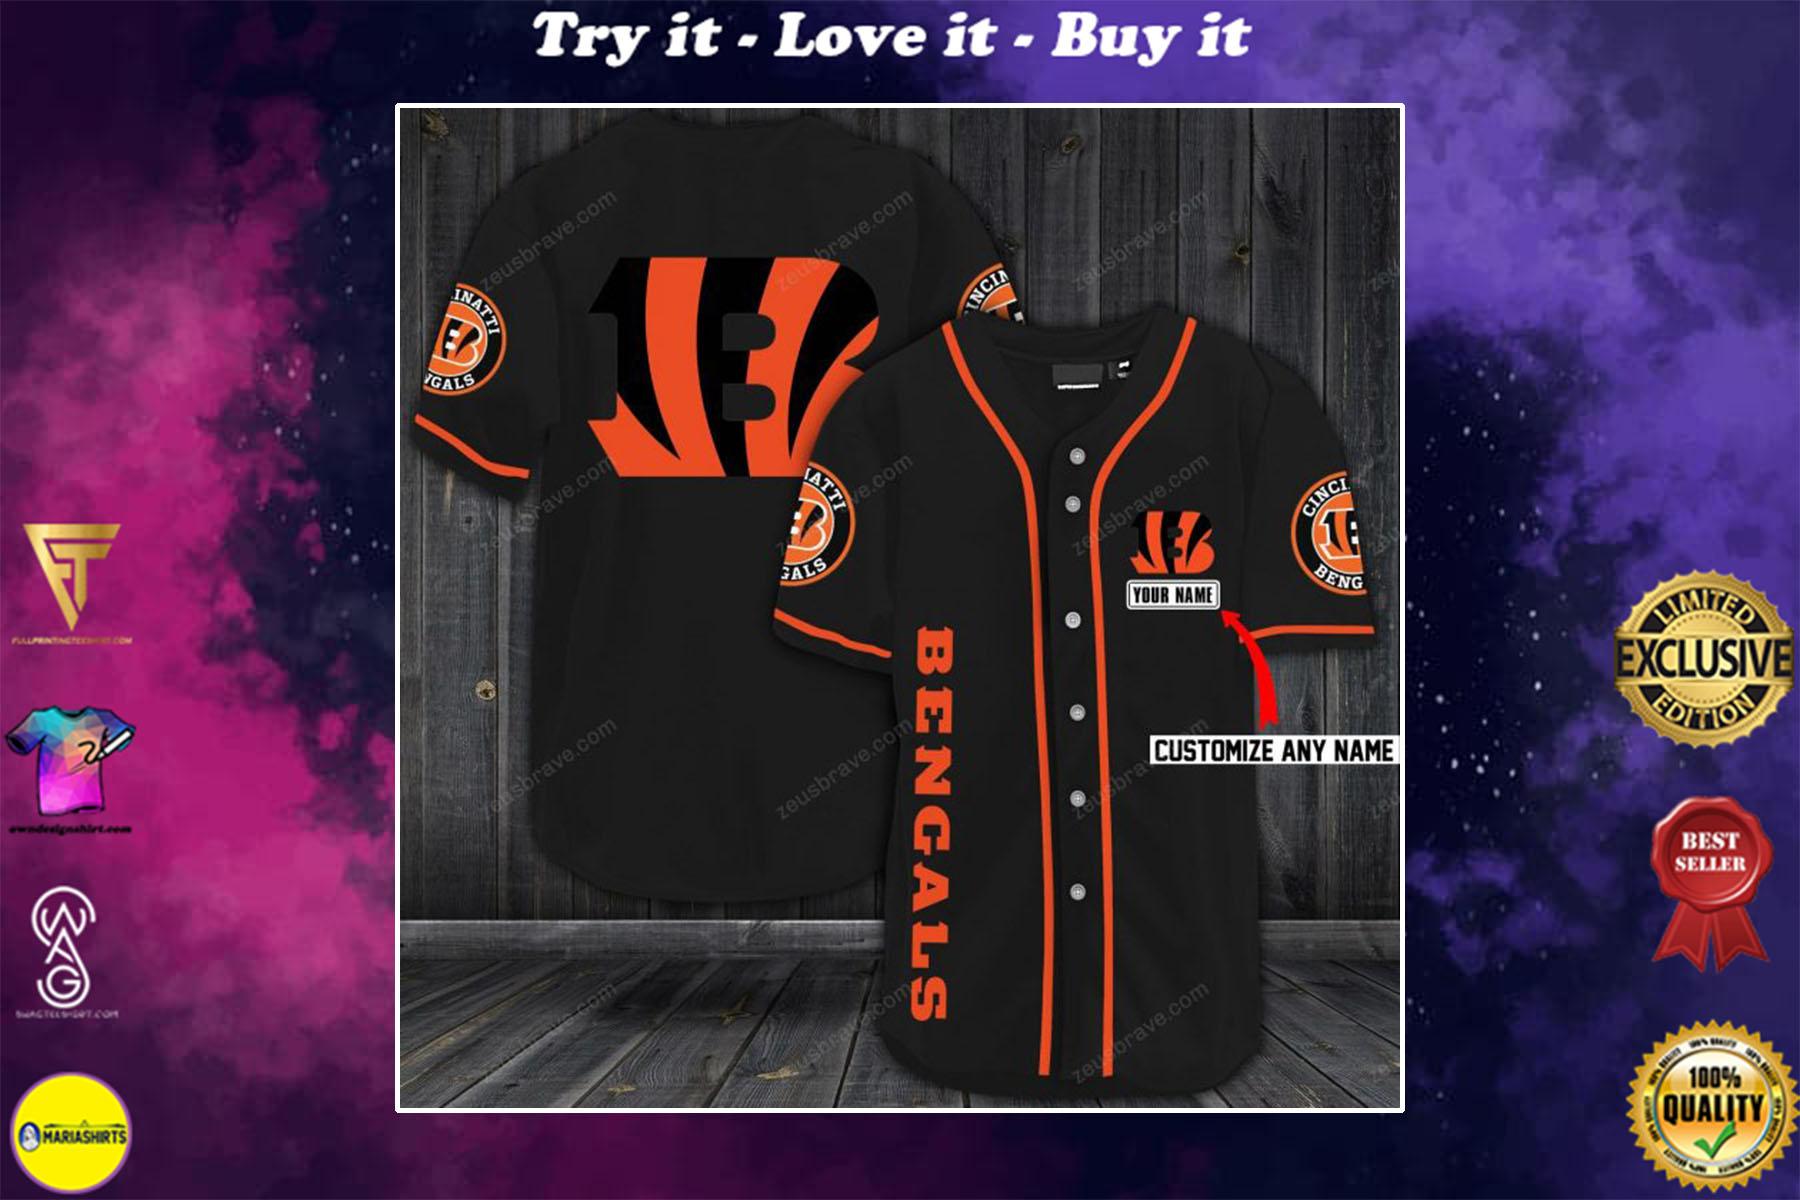 [special edition] custom name jersey cincinnati bengals shirt - maria